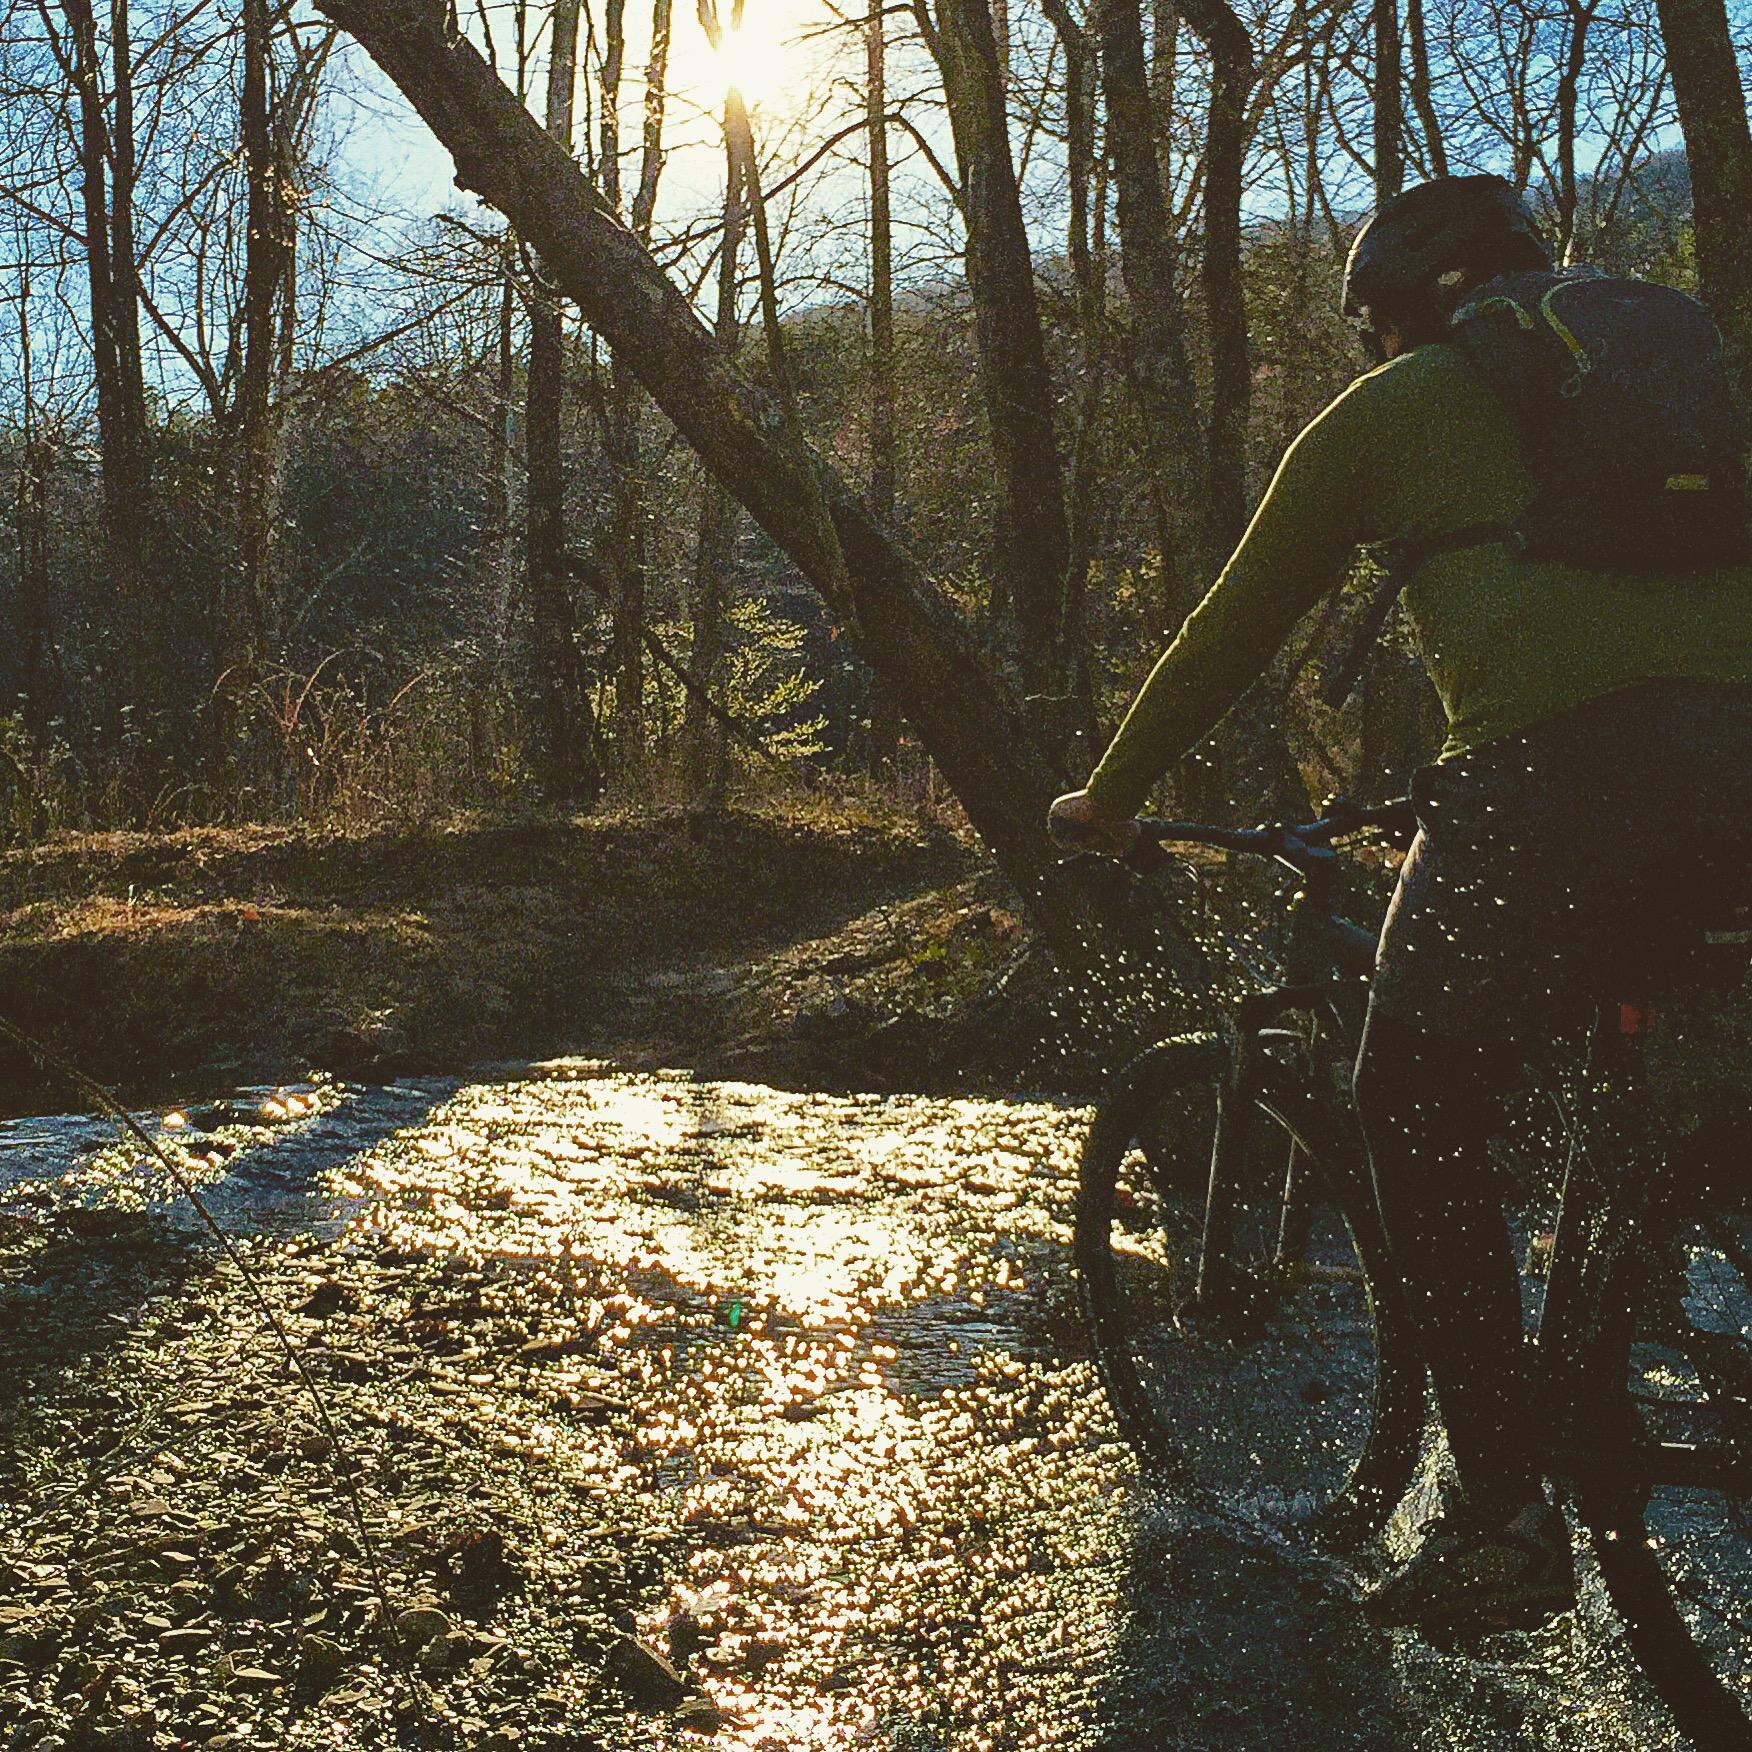 Mountain Biking at Carvins Cove in Roanoke Virginia